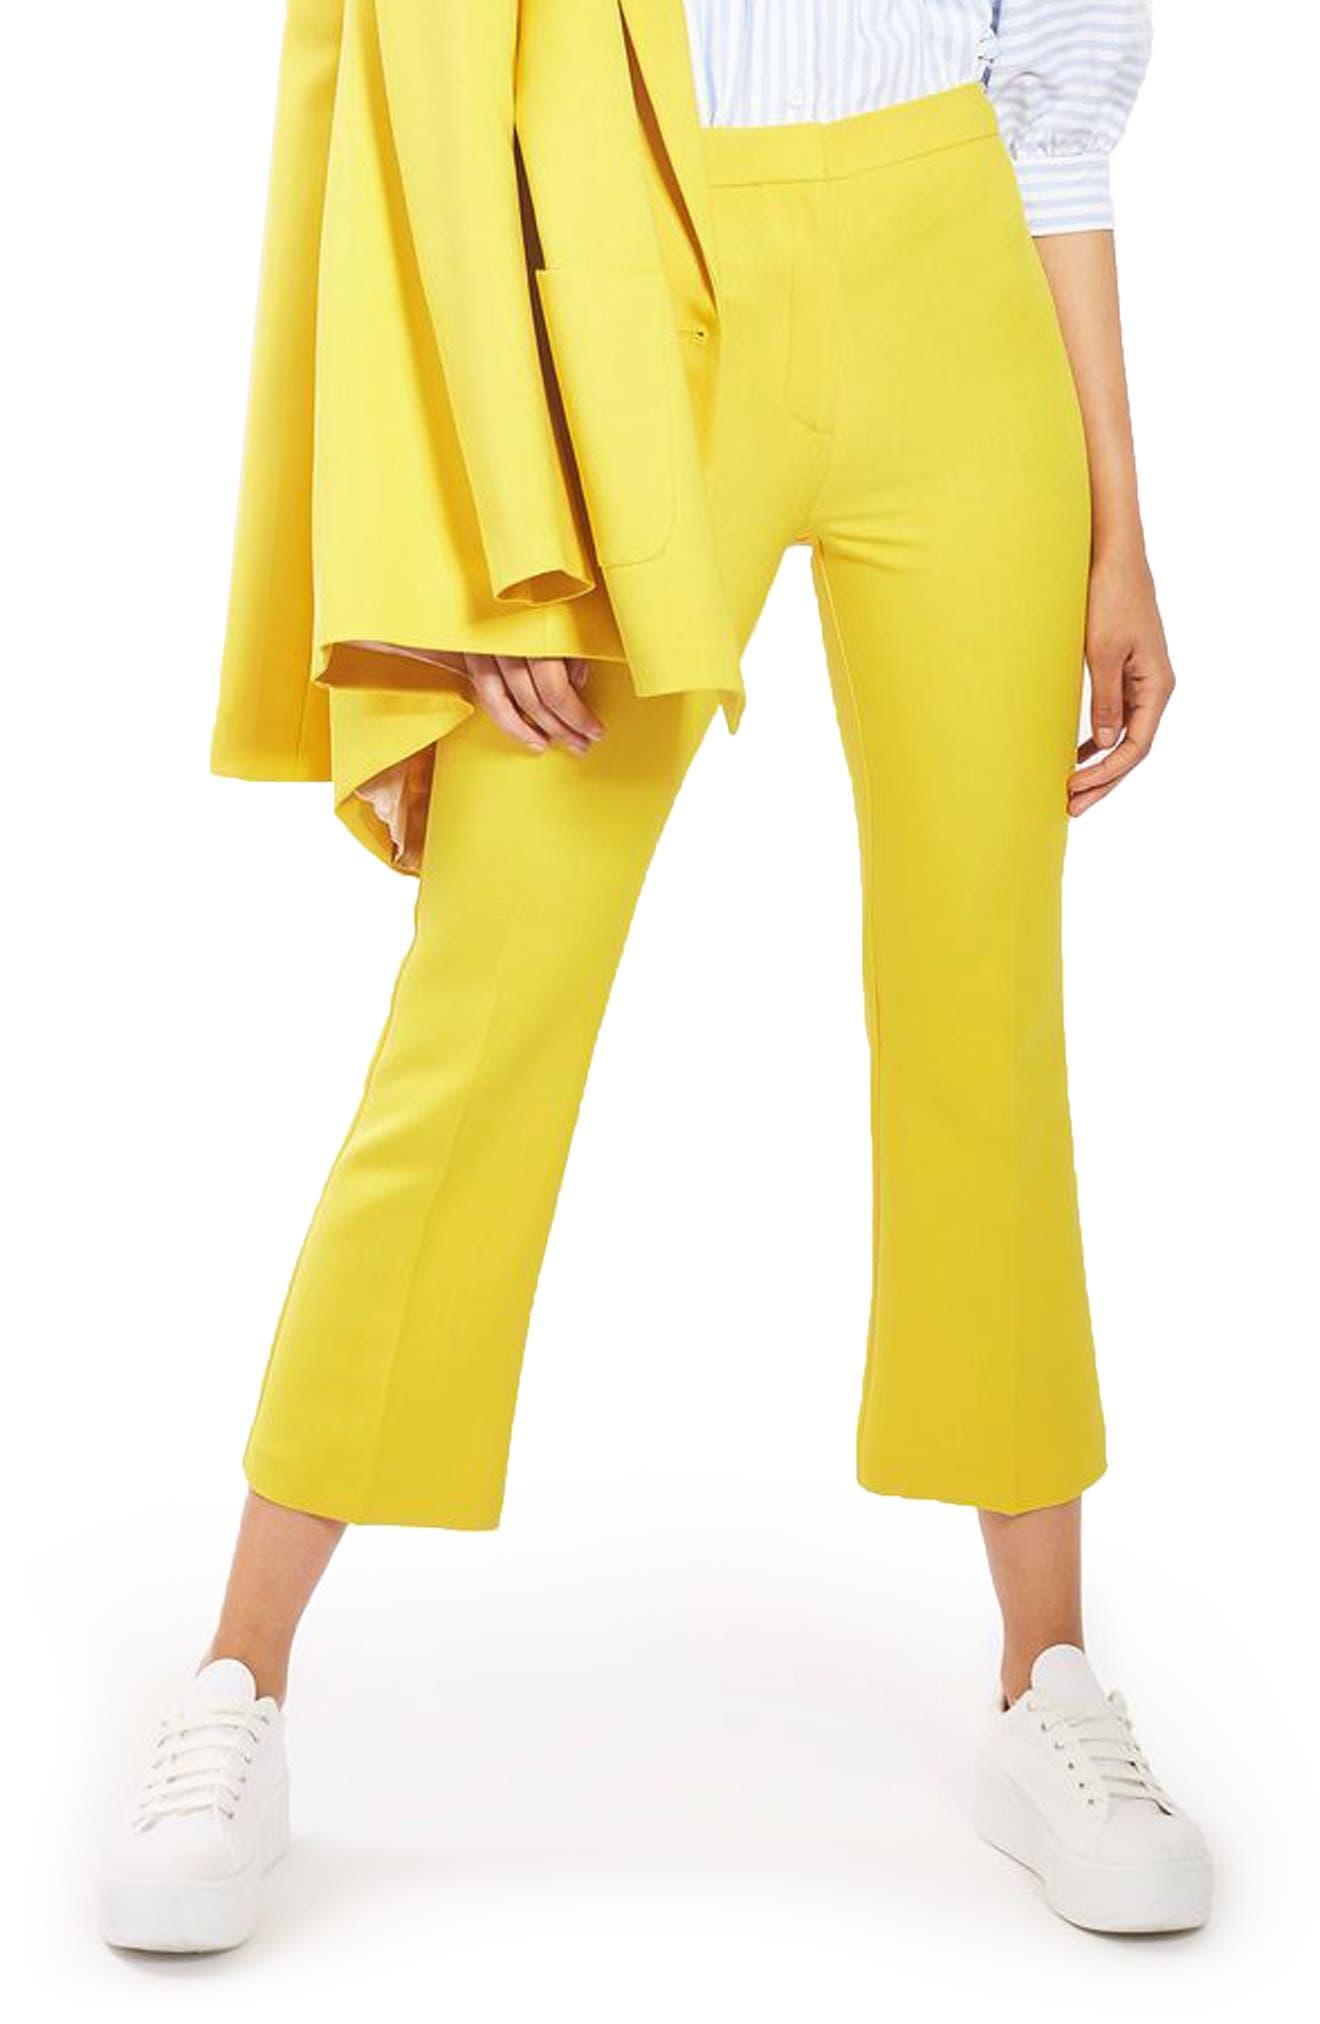 Alternate Image 1 Selected - Topshop Crop Kick Flare Trousers